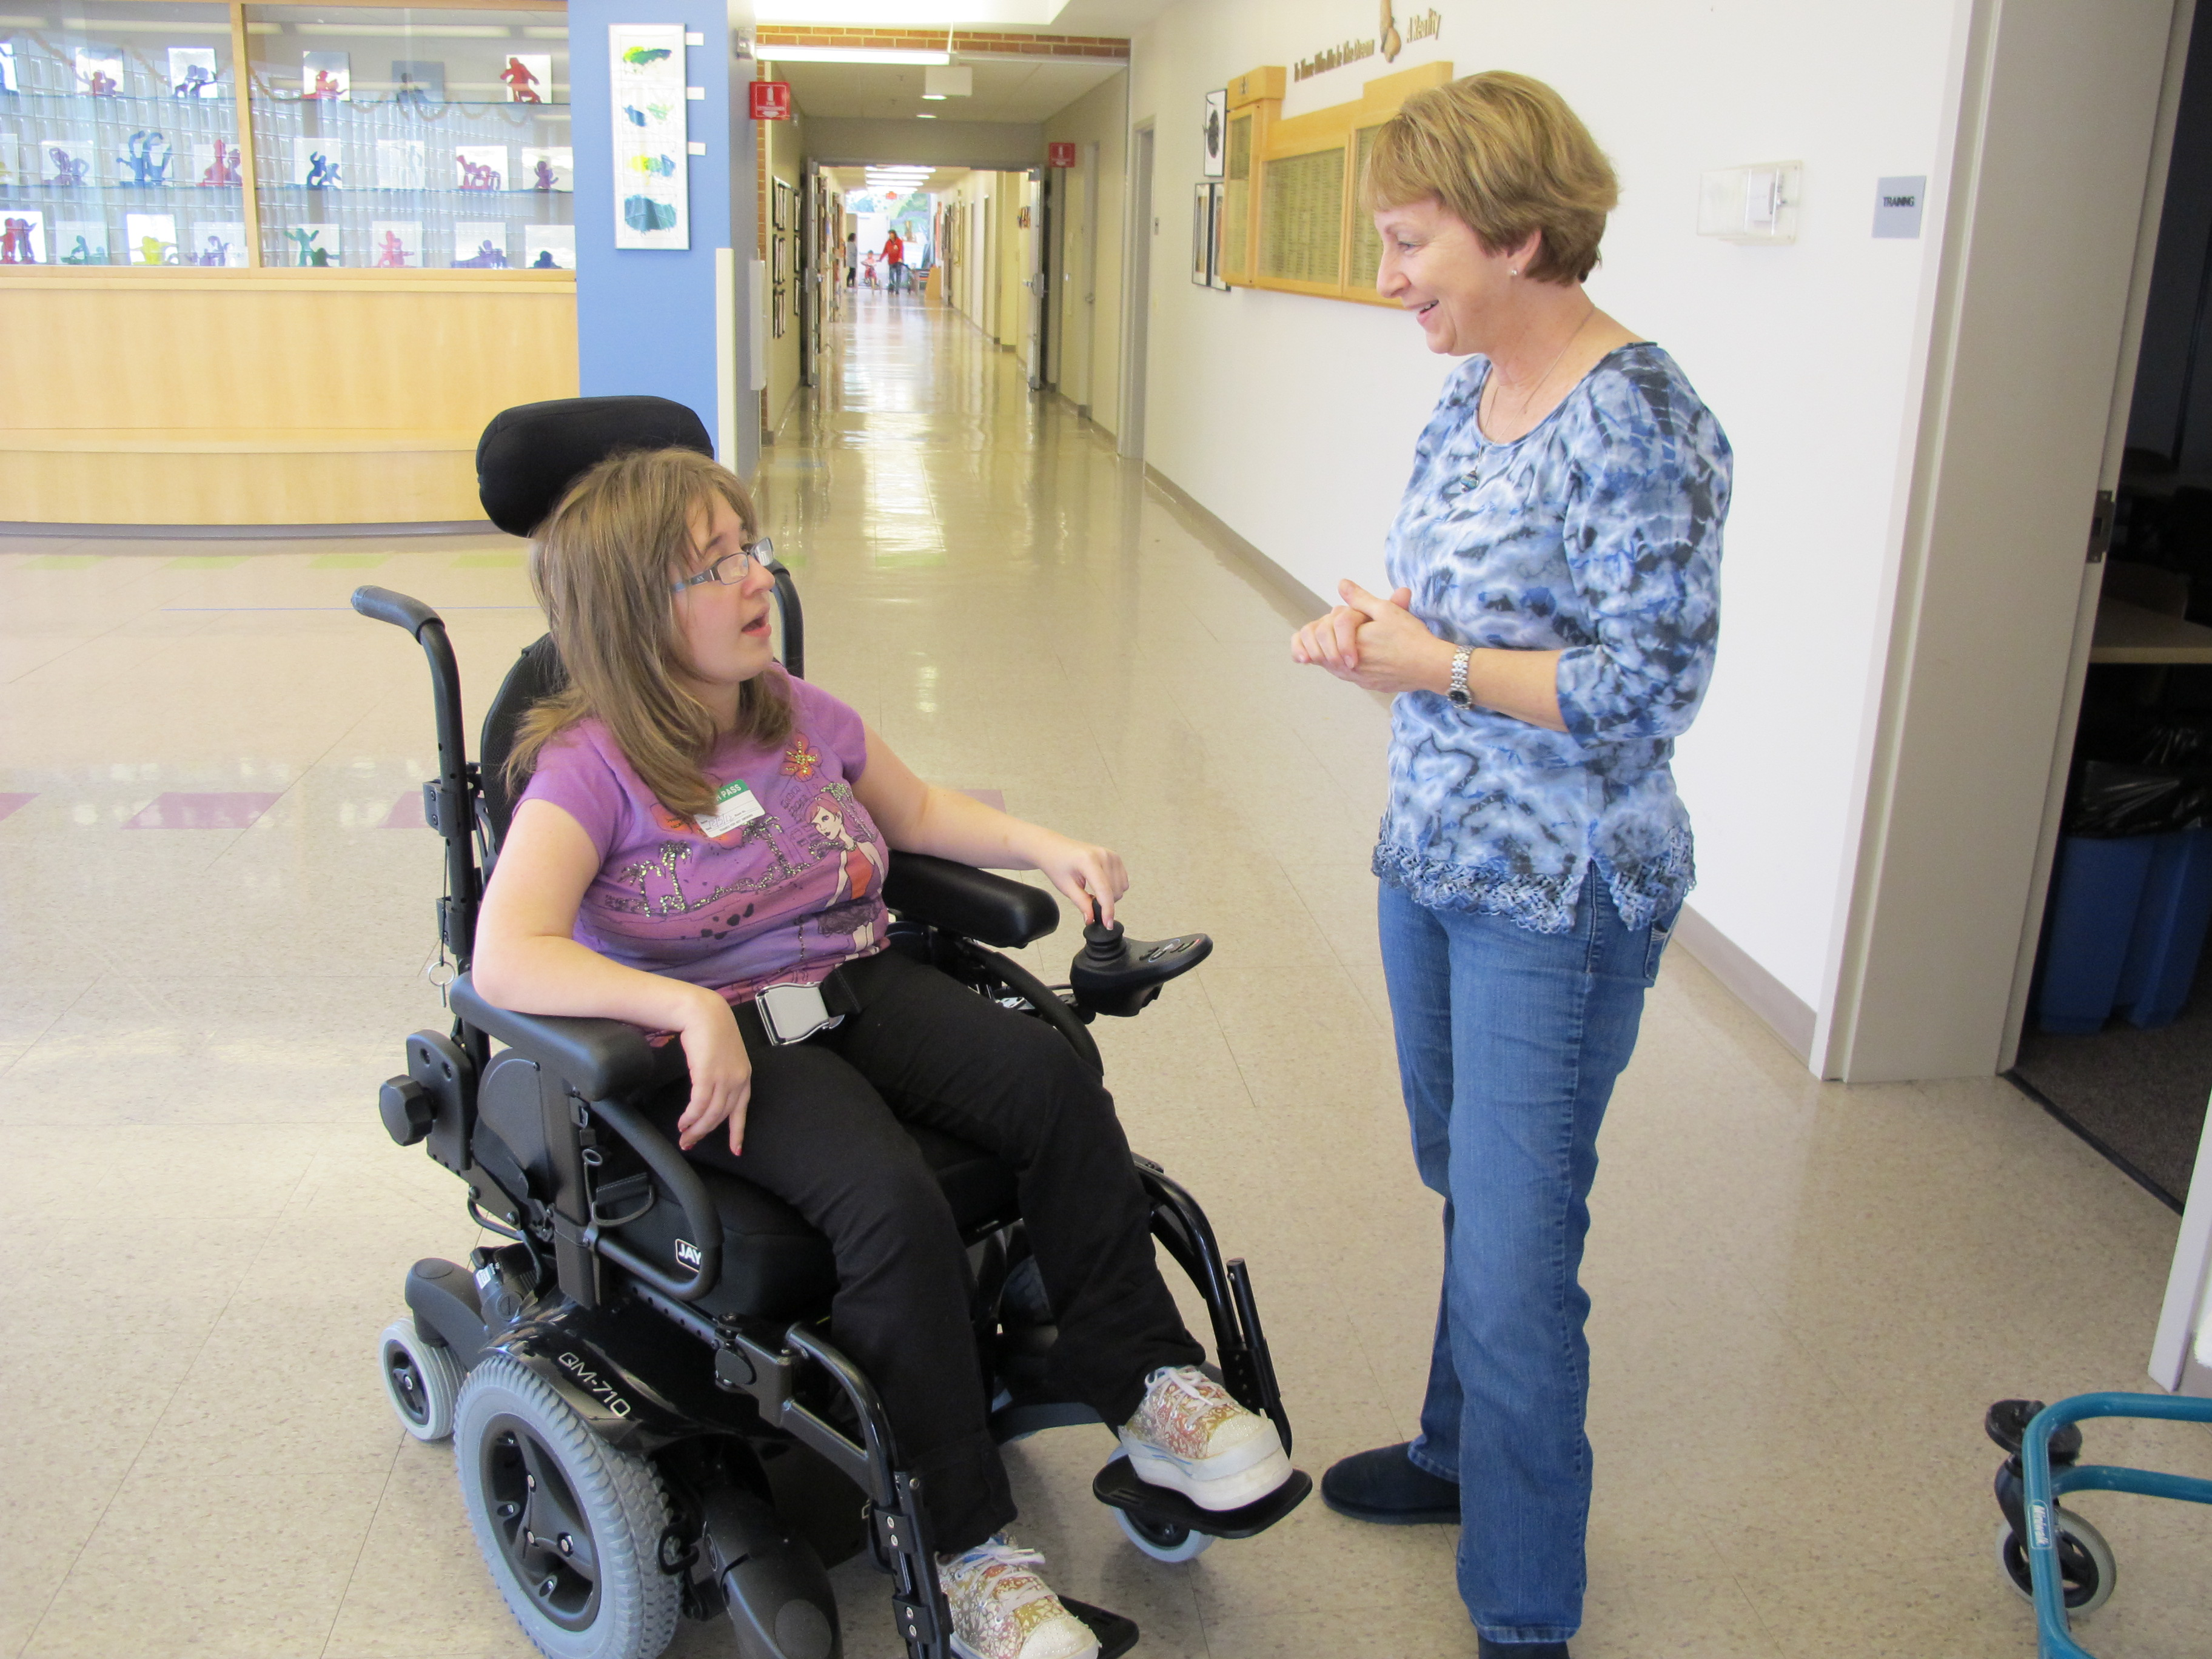 Power wheelchair kids - Image